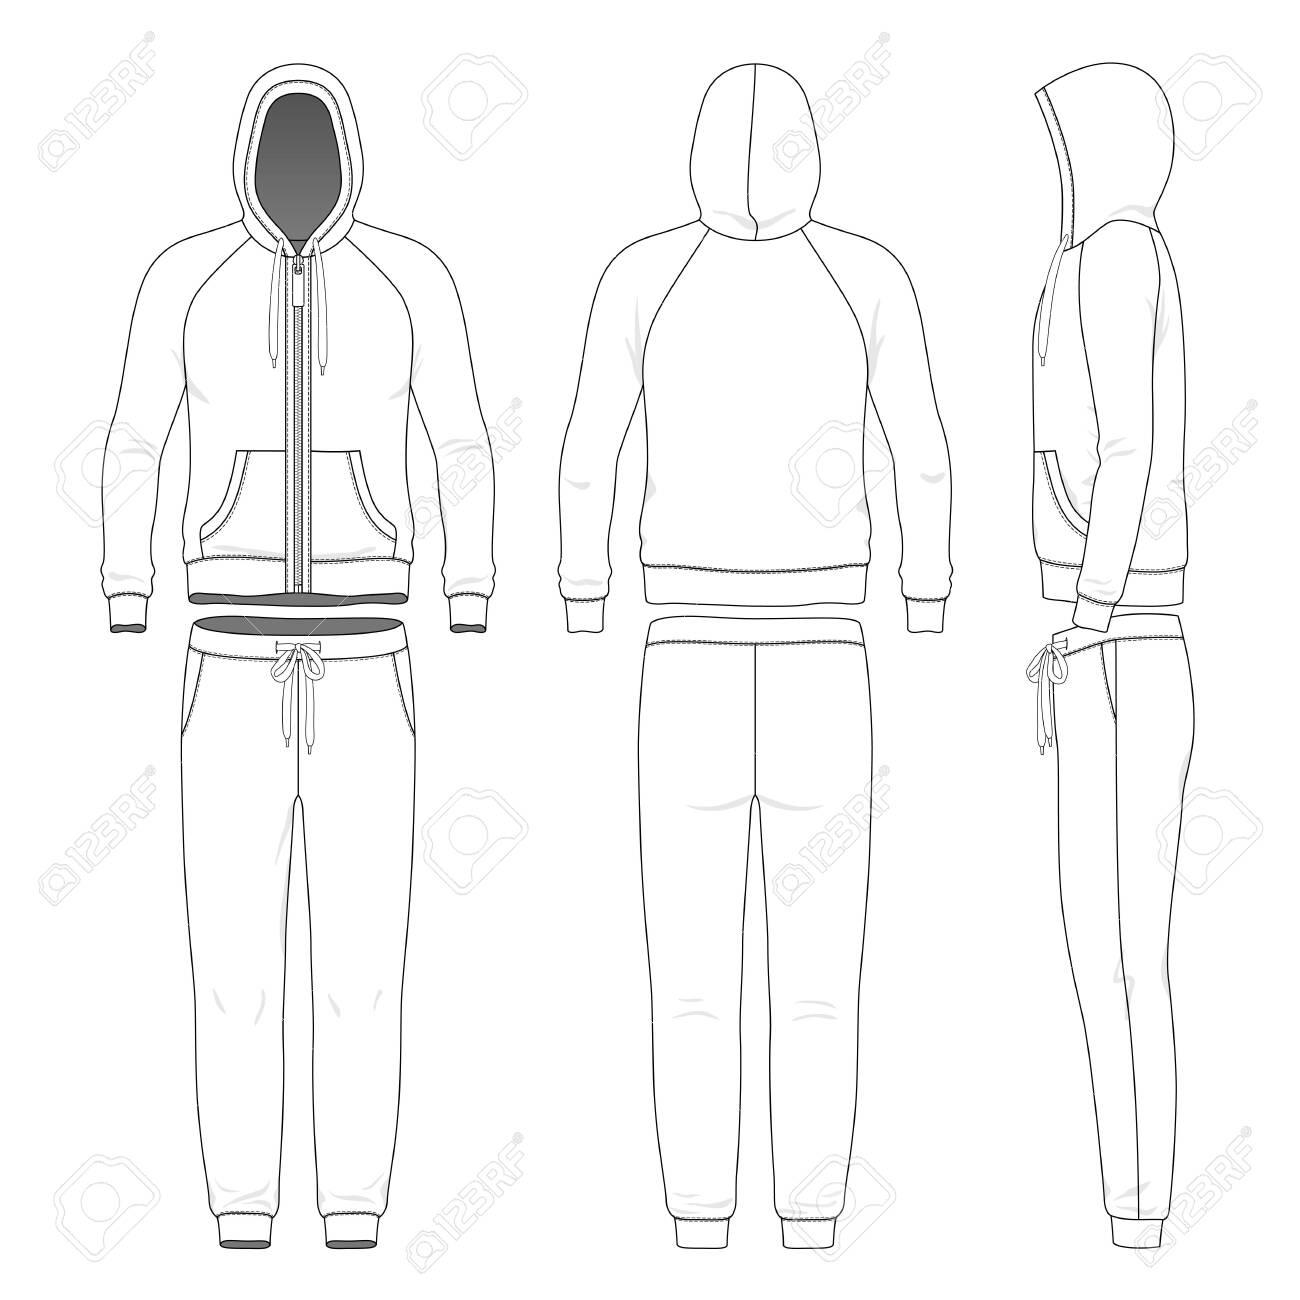 Clothing set of man hoodie and pants. - 134530536